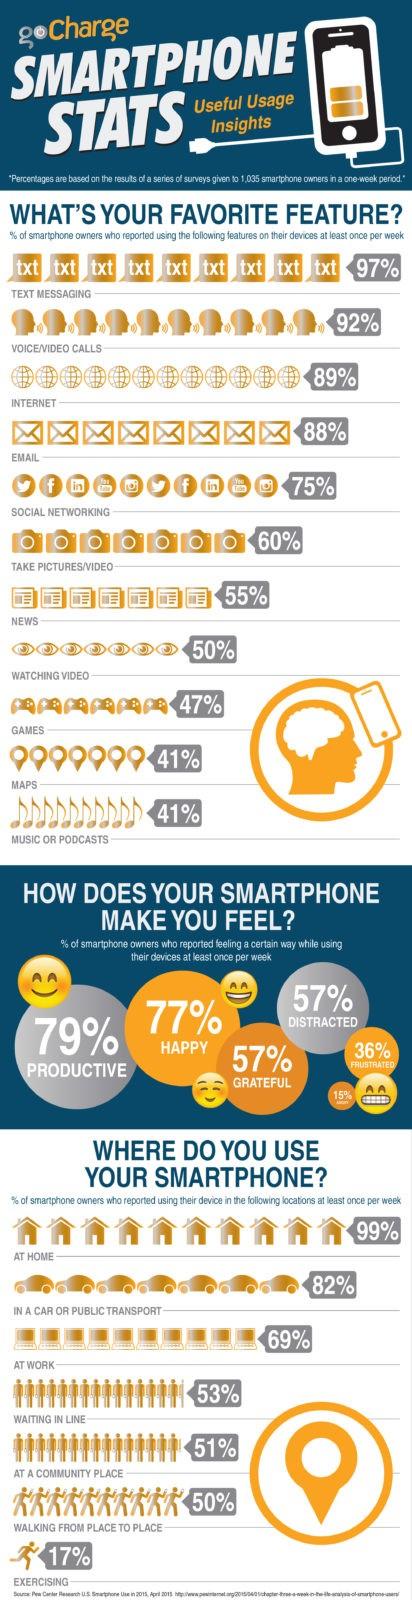 Smartphone Statistics - Cell Phone Usage